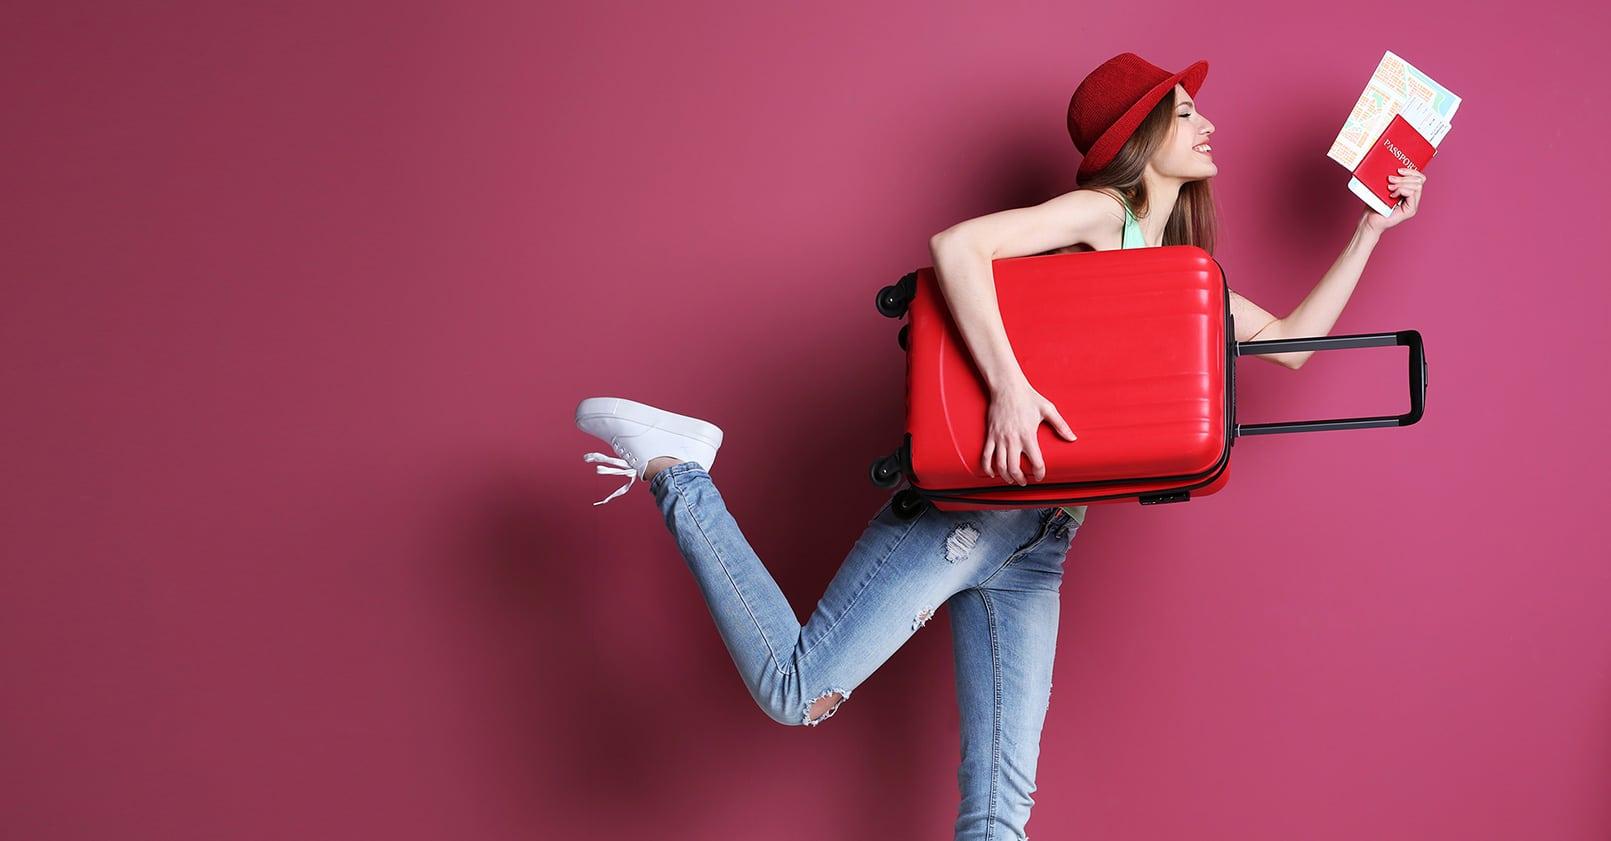 red traveller